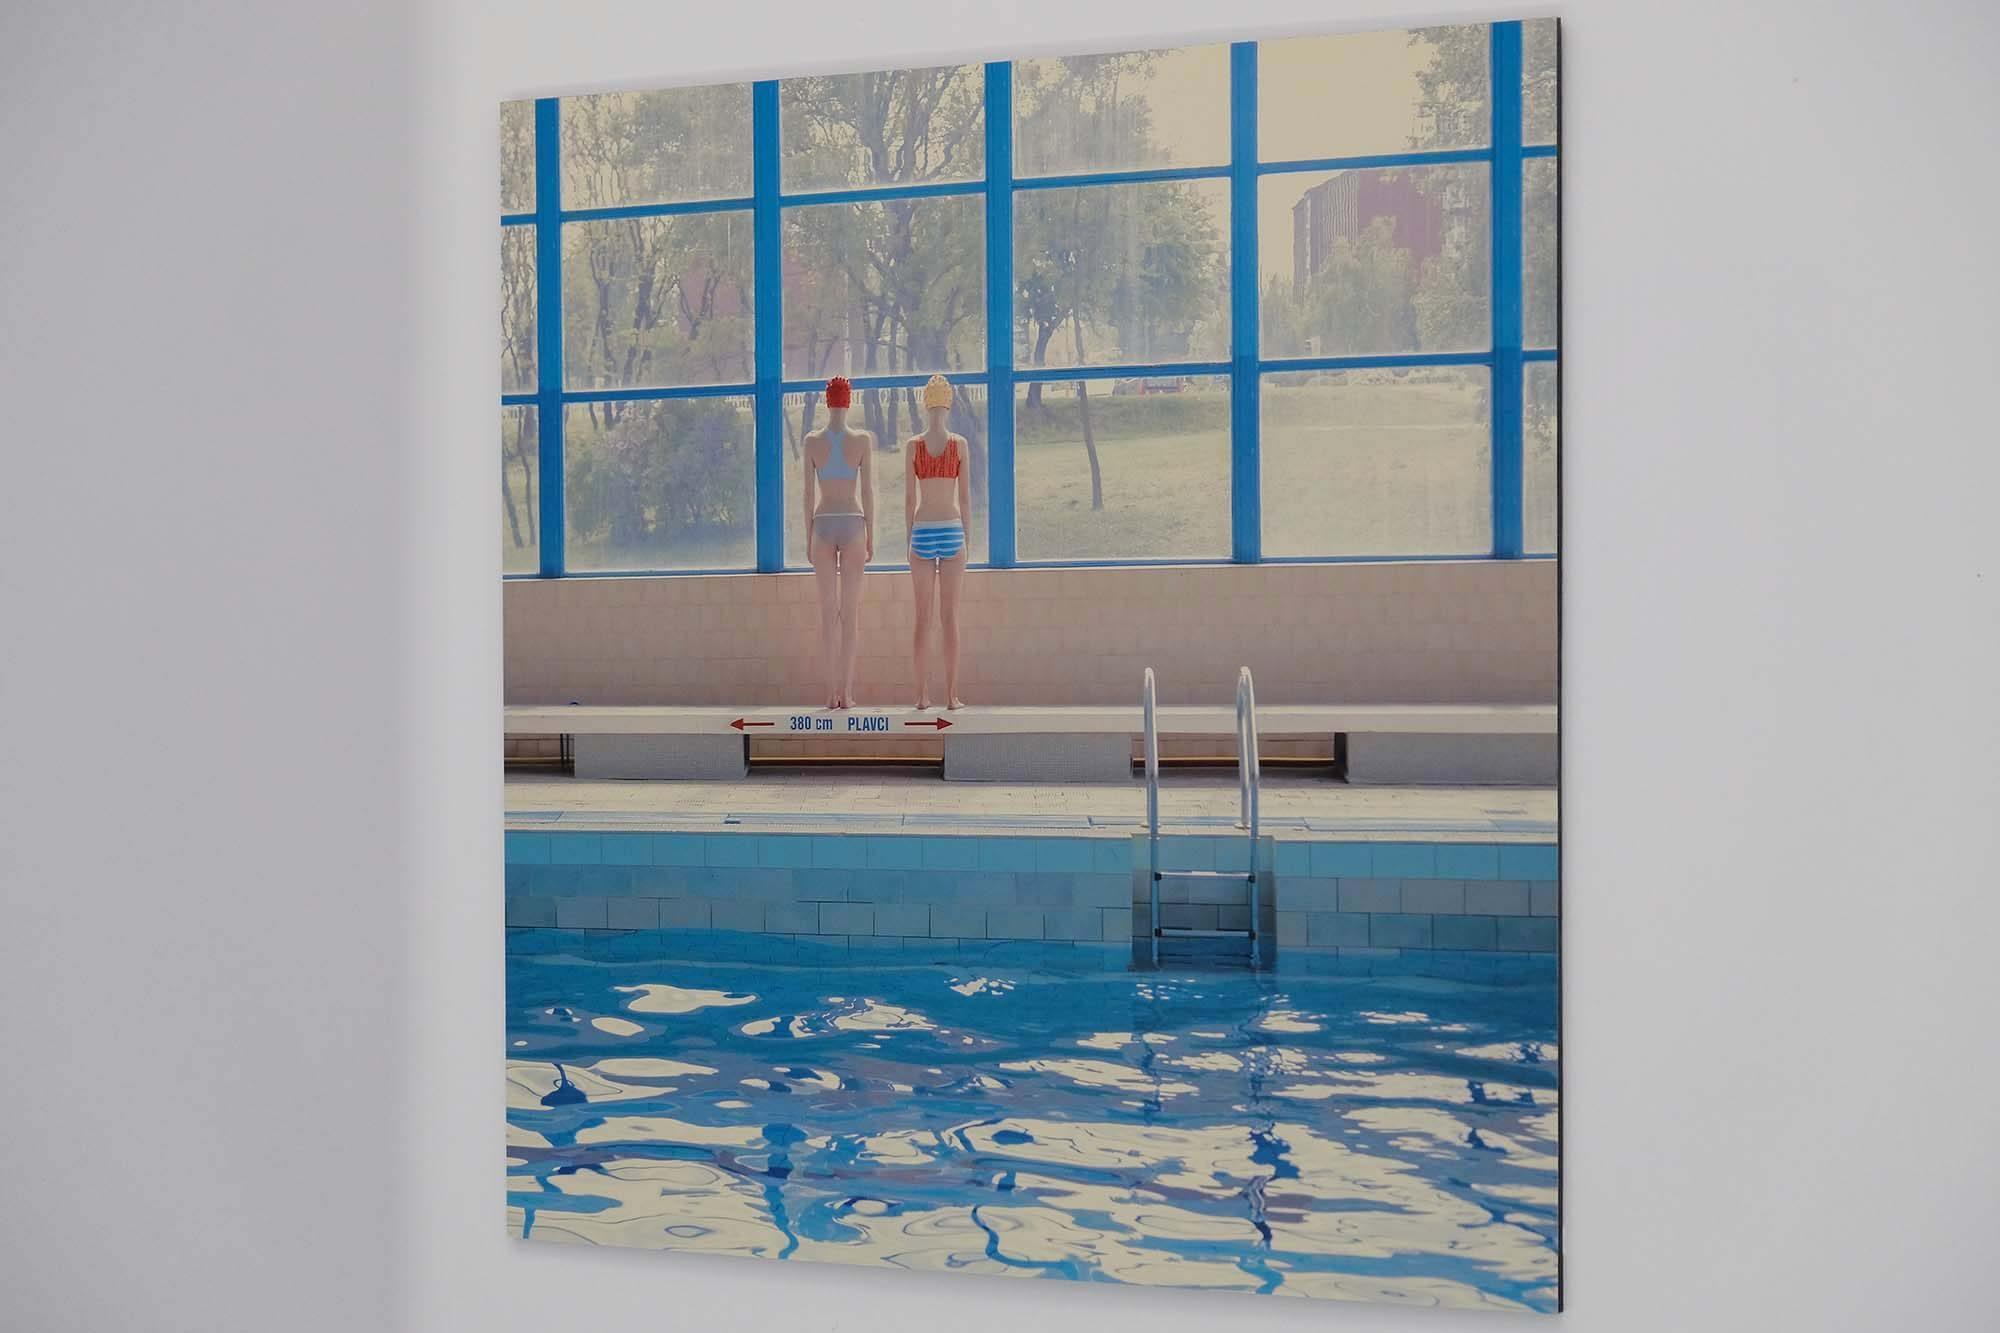 Maria-Svarbova-exhibition-taipei-10